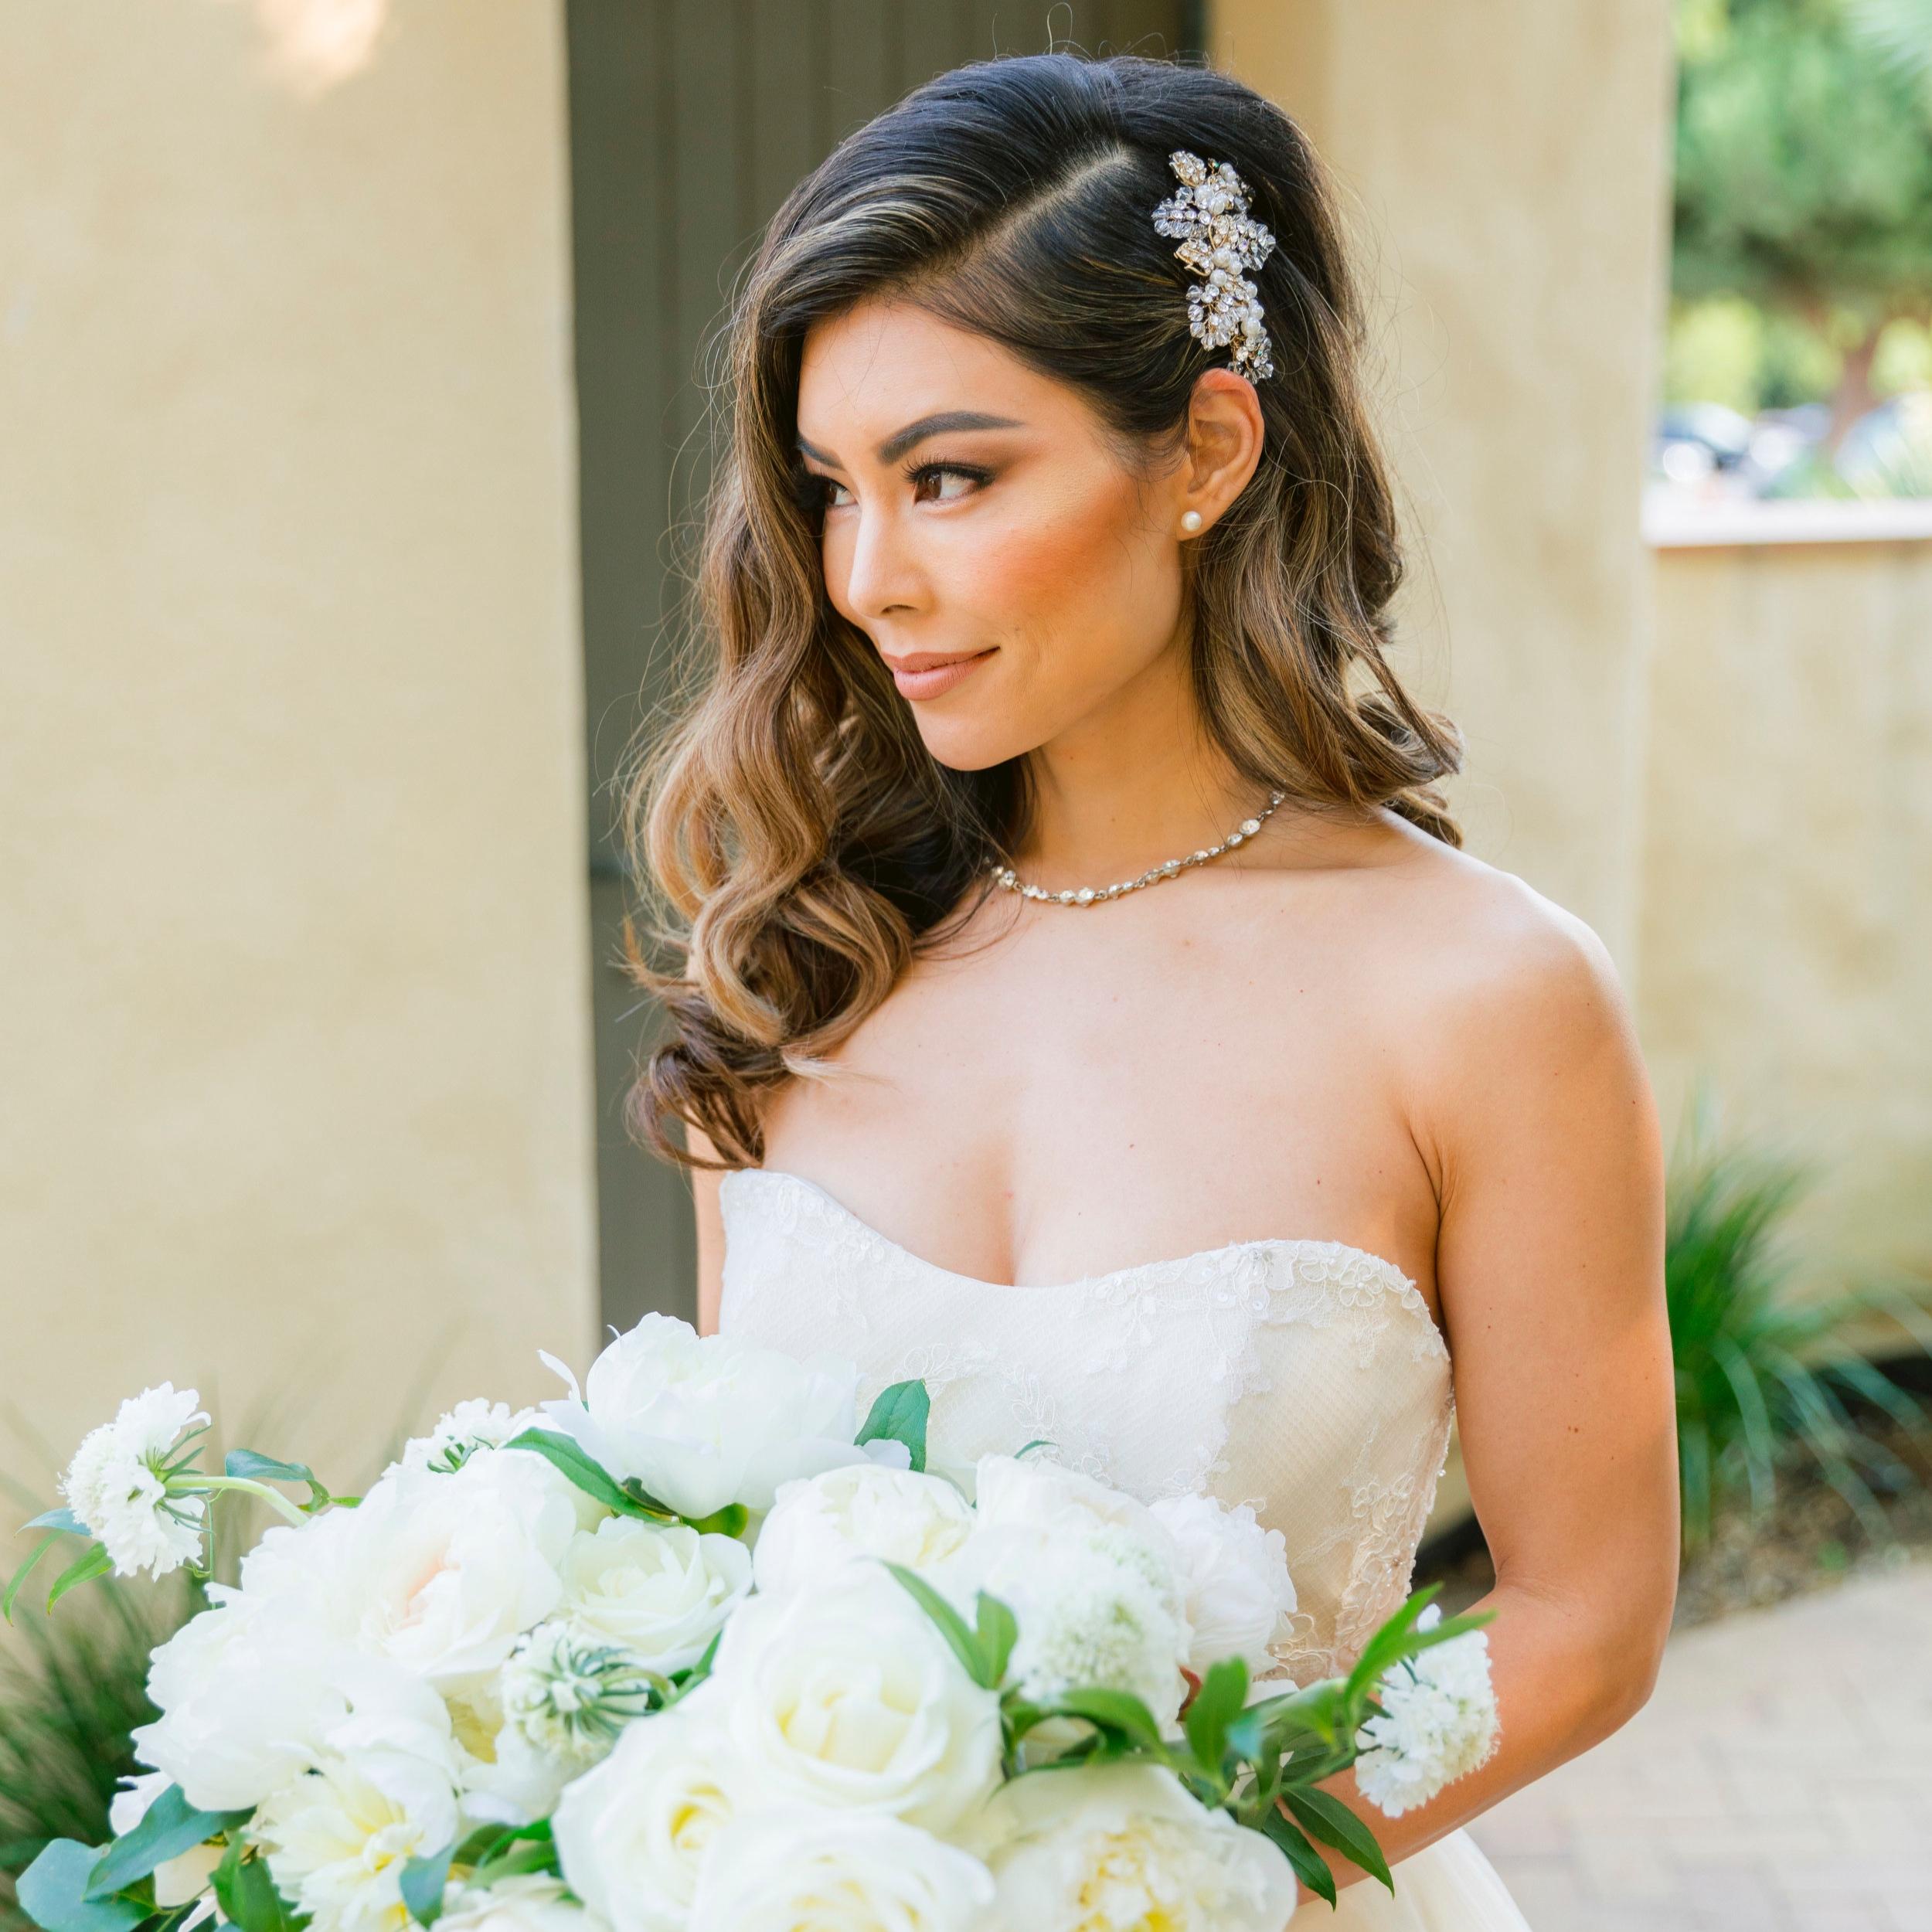 Bride_Prep_0075.jpg